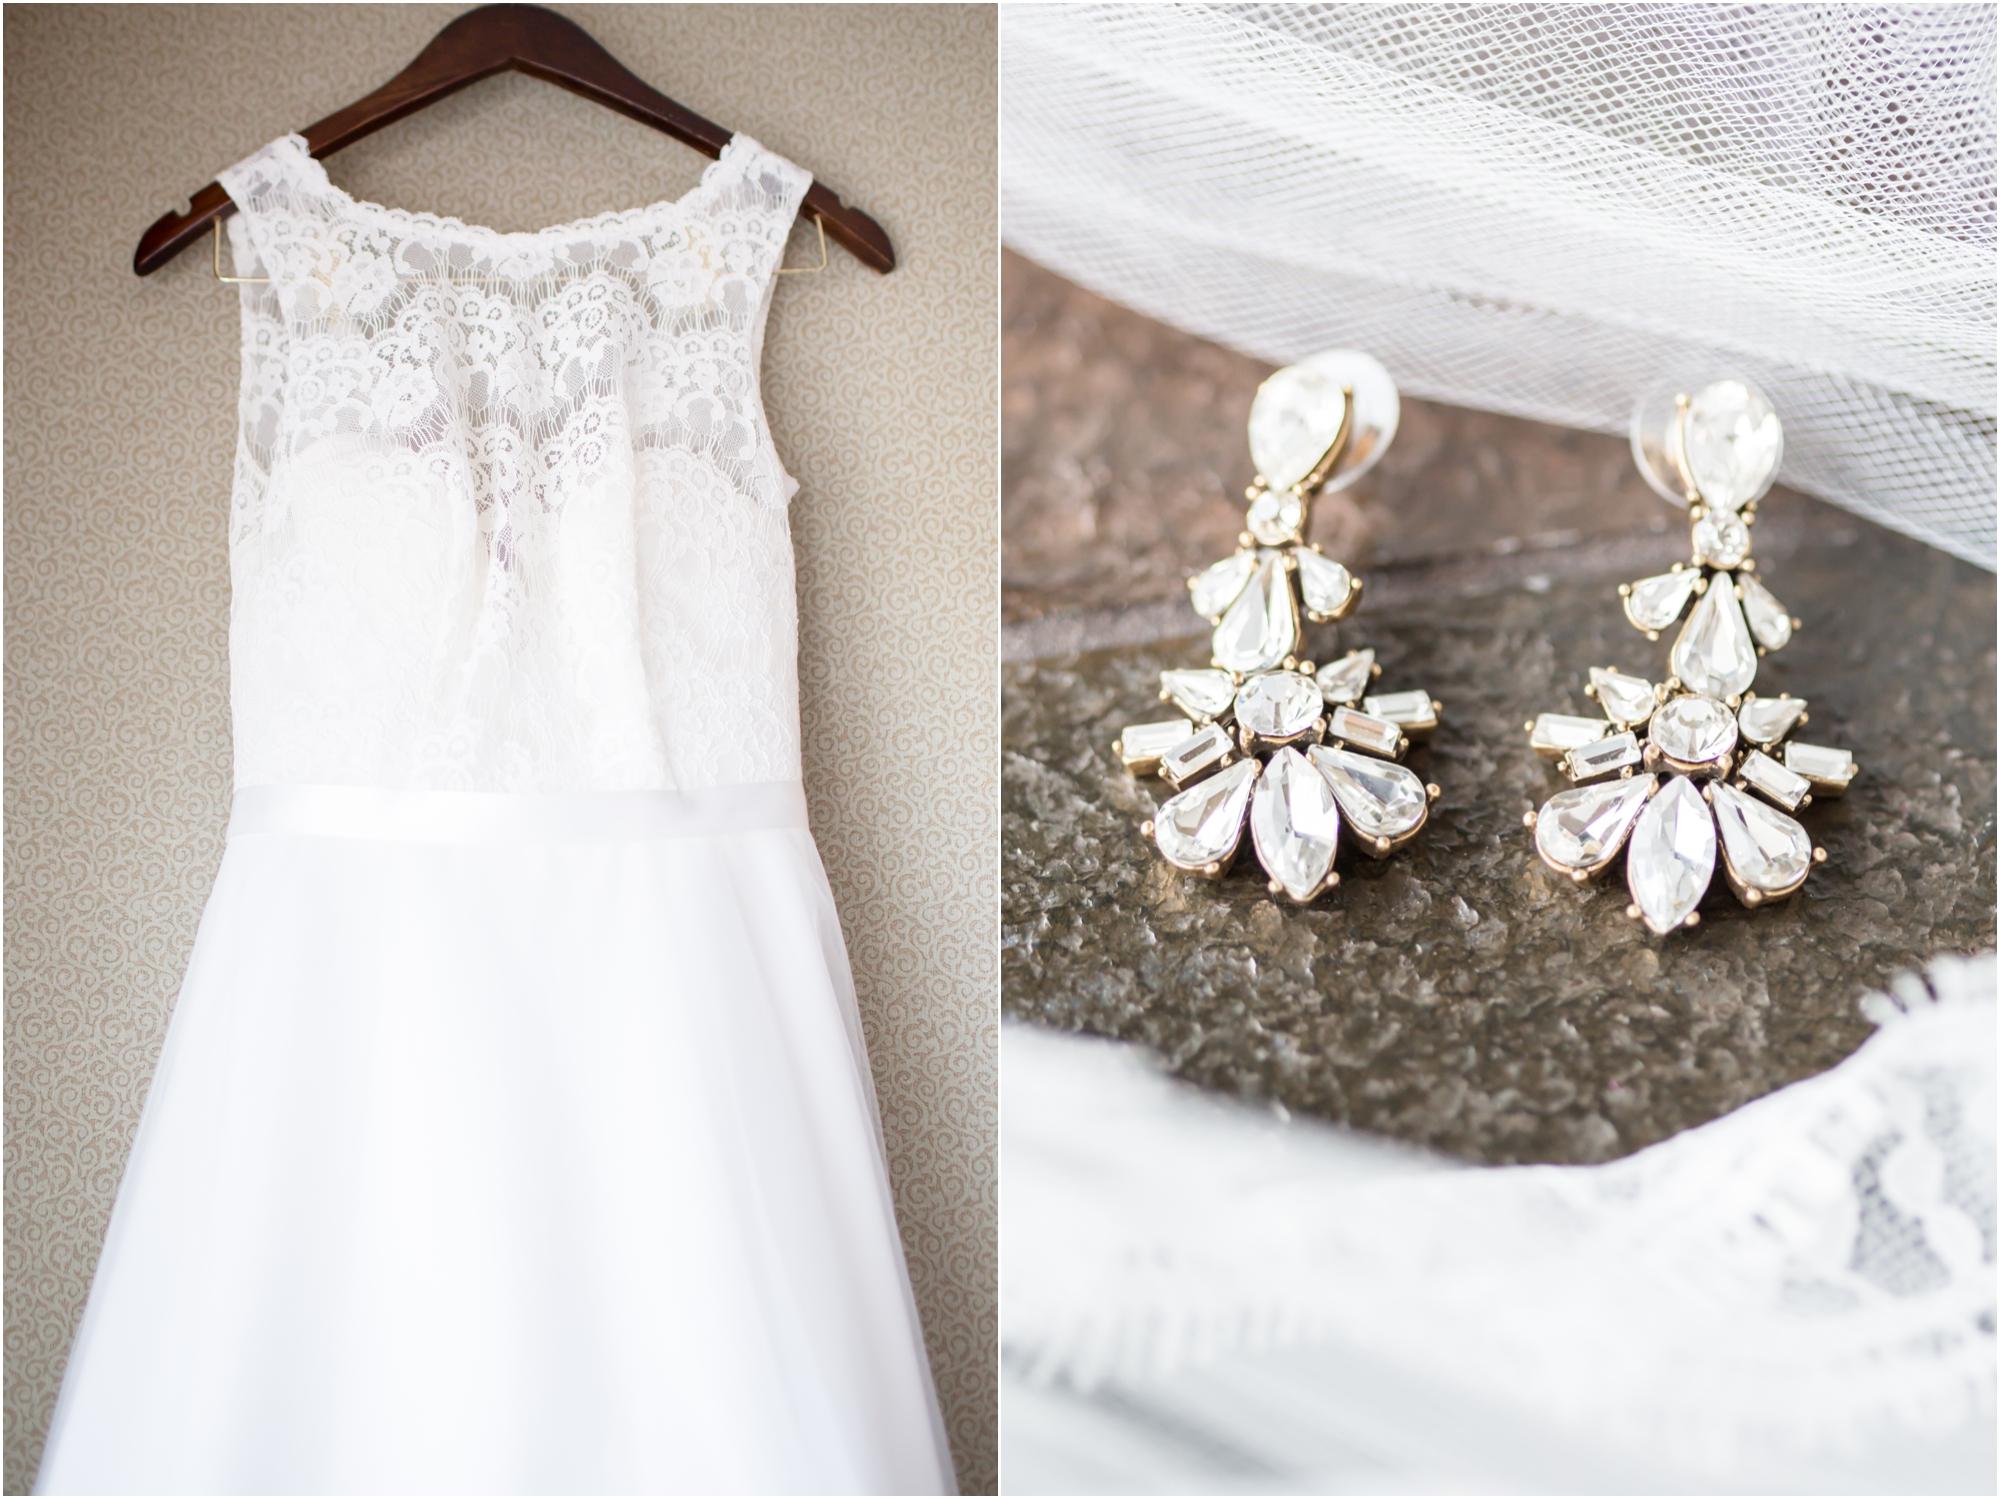 1-Finkel Wedding Getting Ready-66_anna grace photography maryland wedding photographer turf valley.jpg